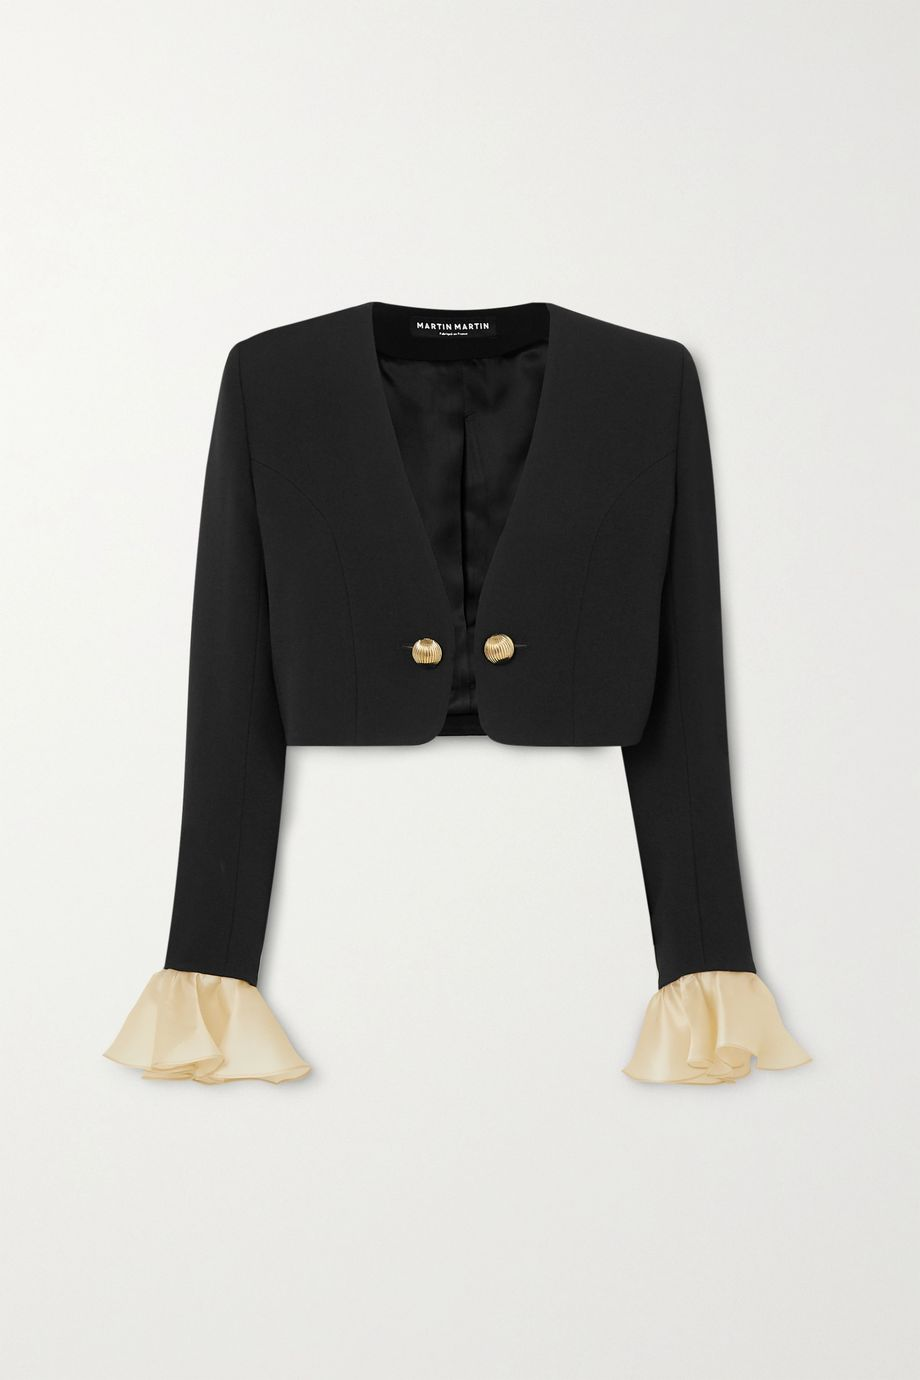 MARTIN MARTIN Joy cropped ruffled organza-trimmed crepe jacket